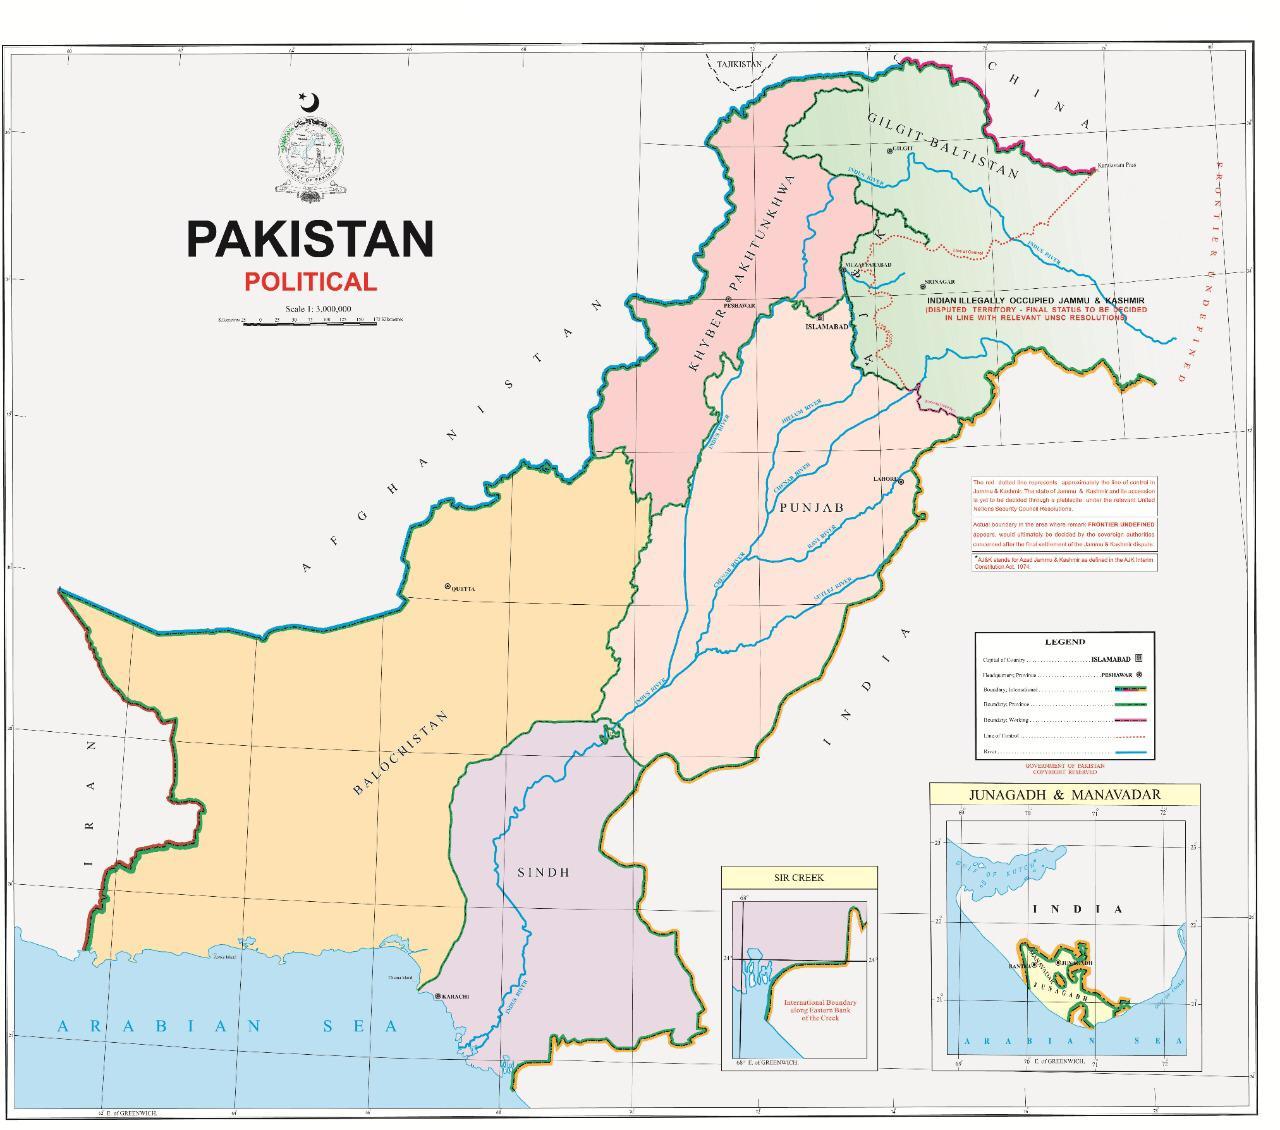 PM Imran unveils new 'political map' of Pakistan | The Express Tribune